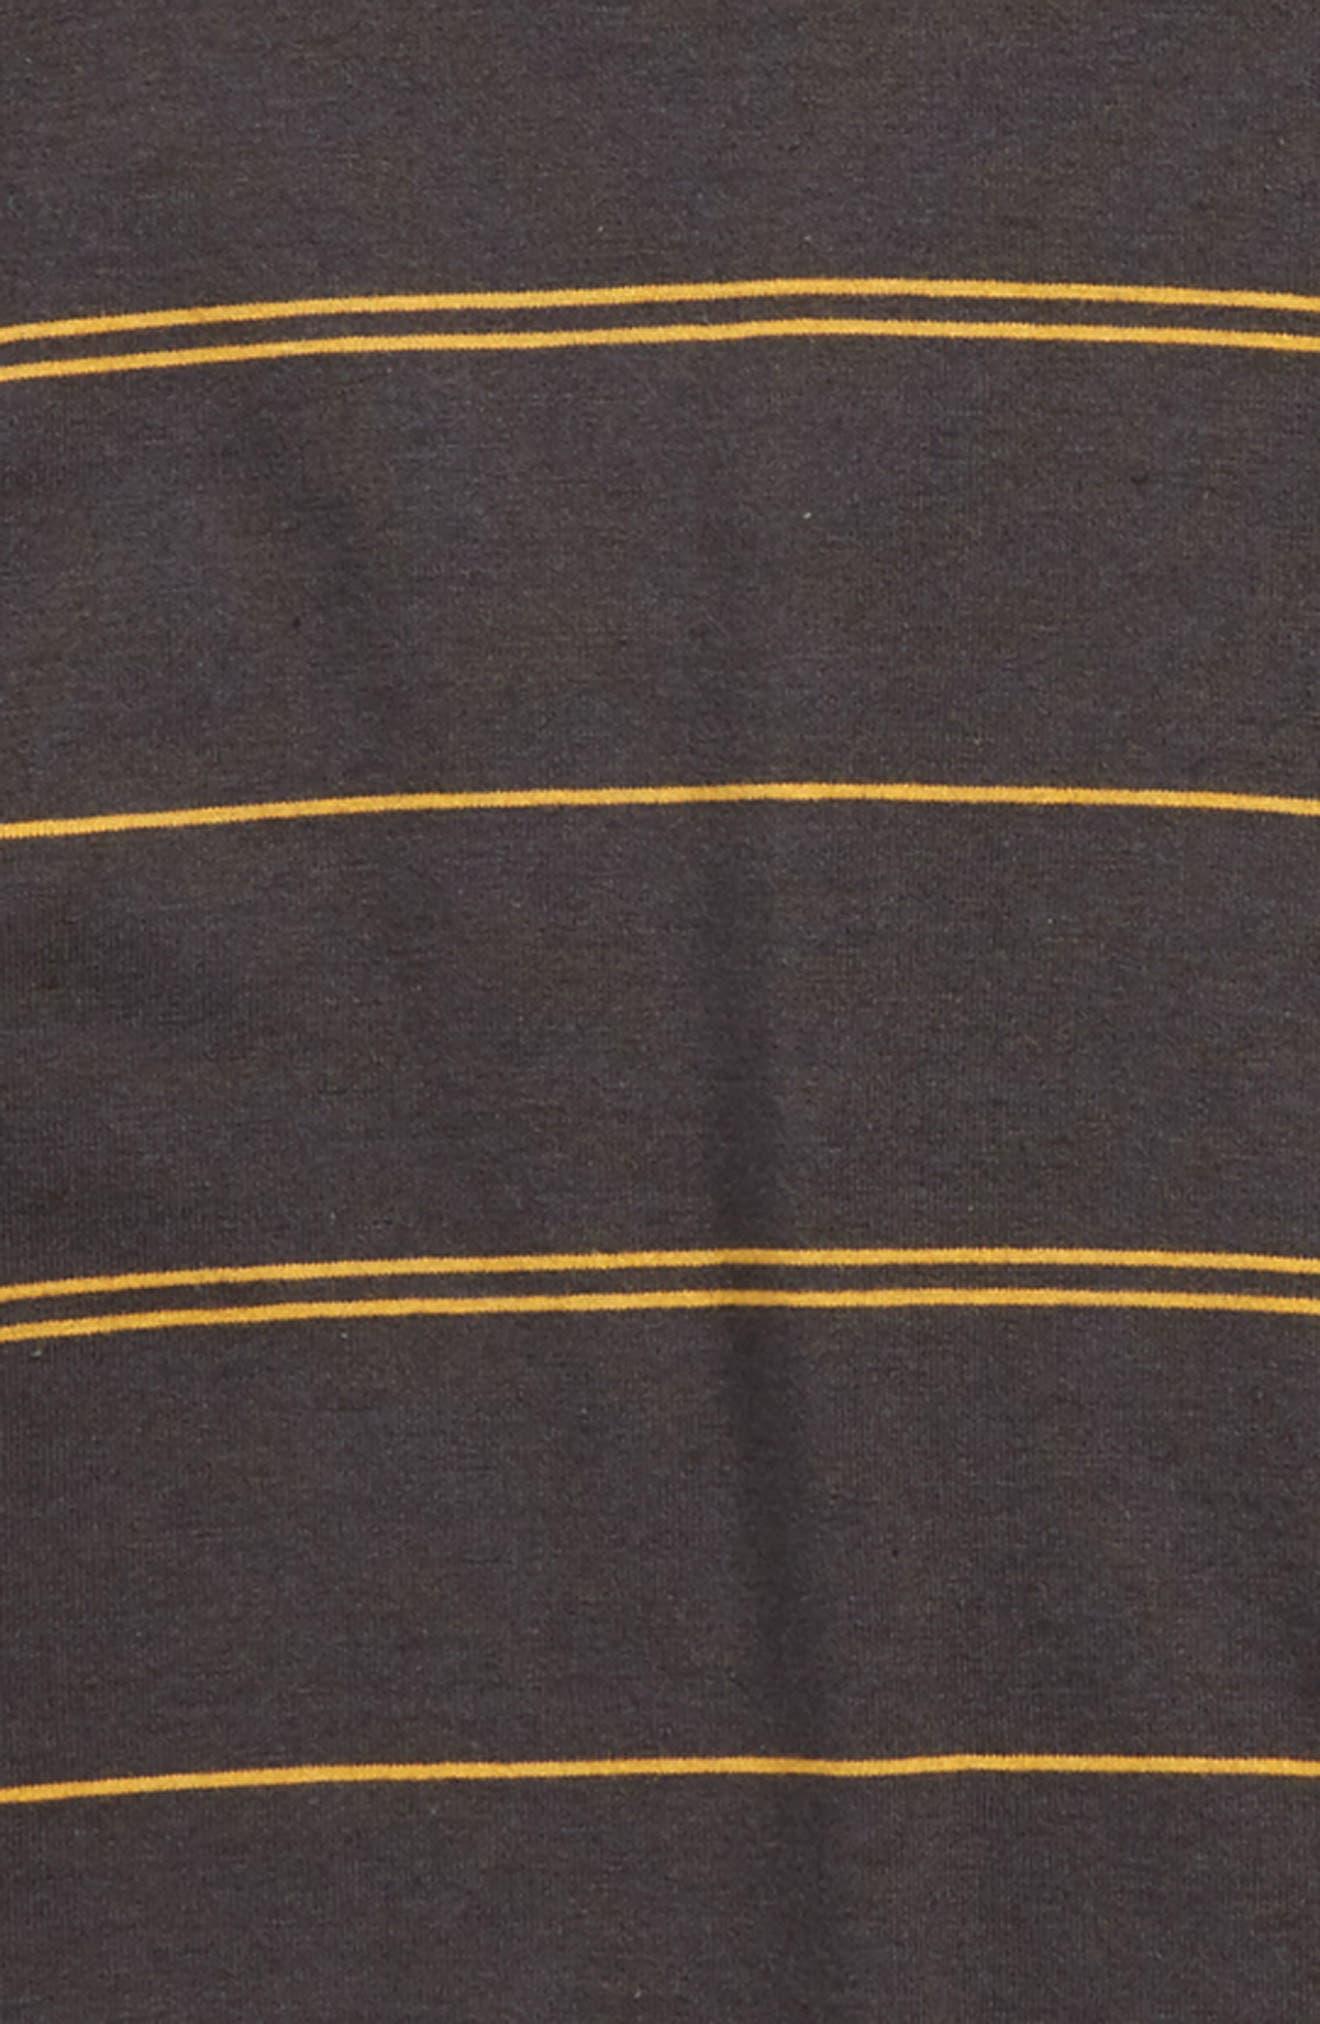 Alternate Image 2  - Billabong Die Cut Stripe Ringer T-Shirt (Big Boys)